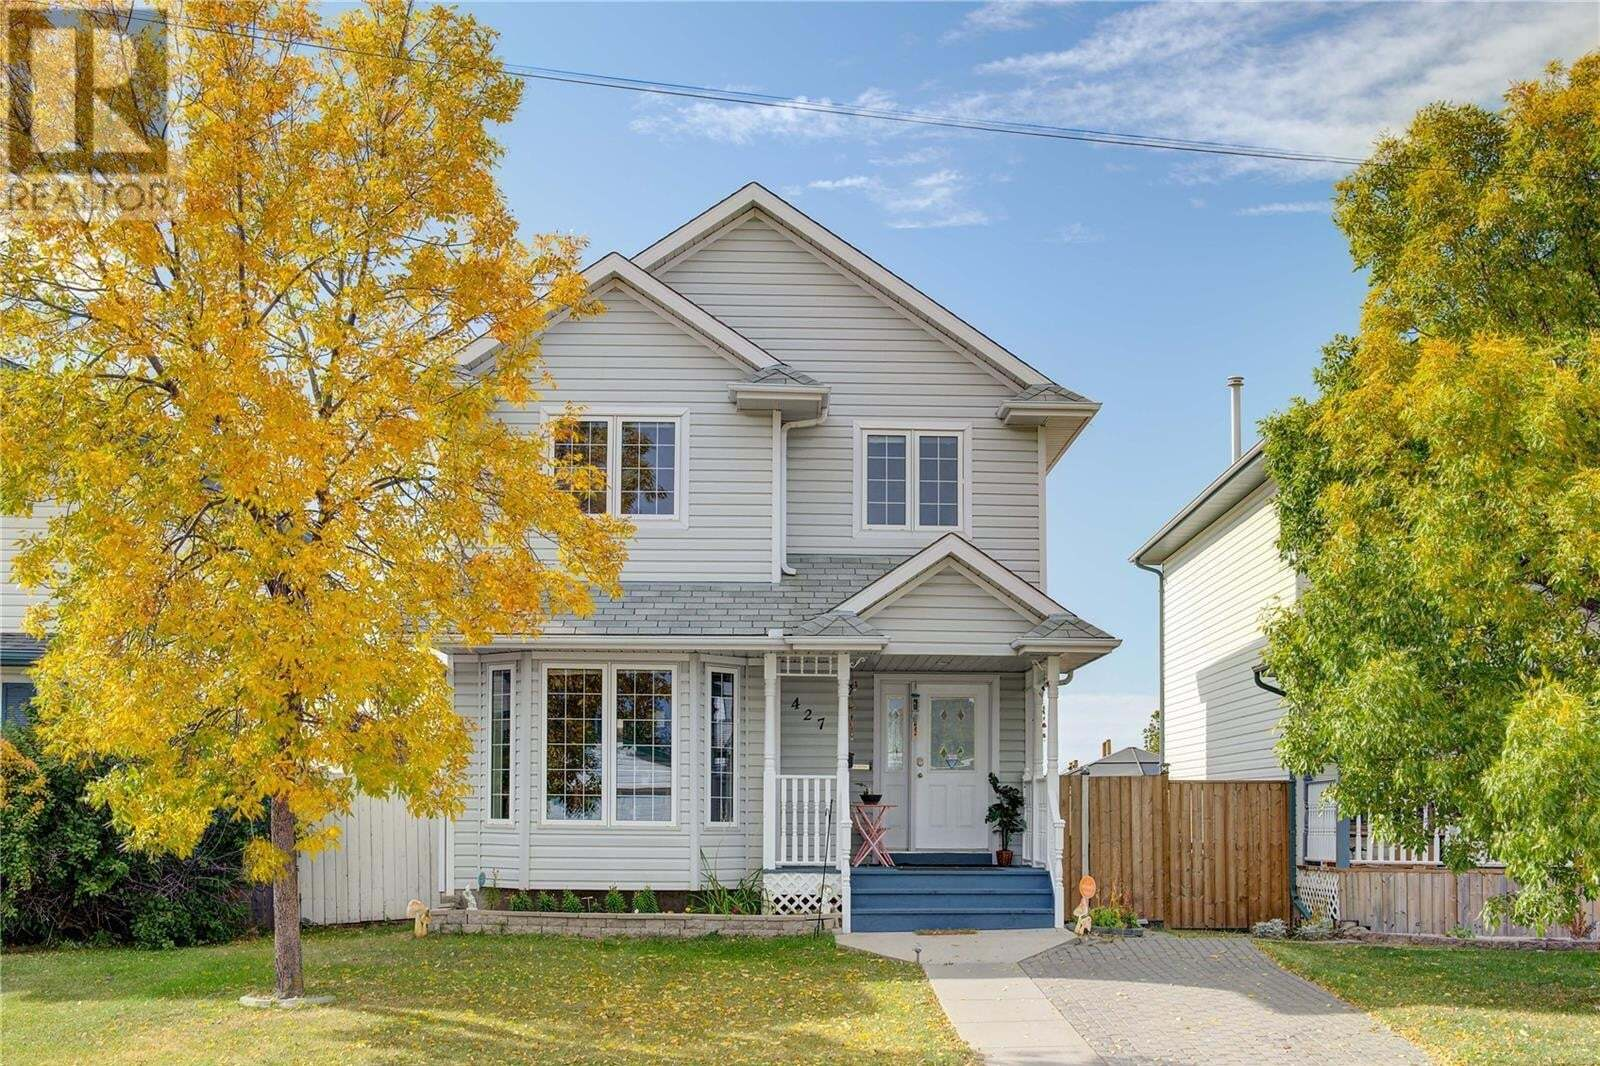 House for sale at 427 Carter Wy Saskatoon Saskatchewan - MLS: SK827973